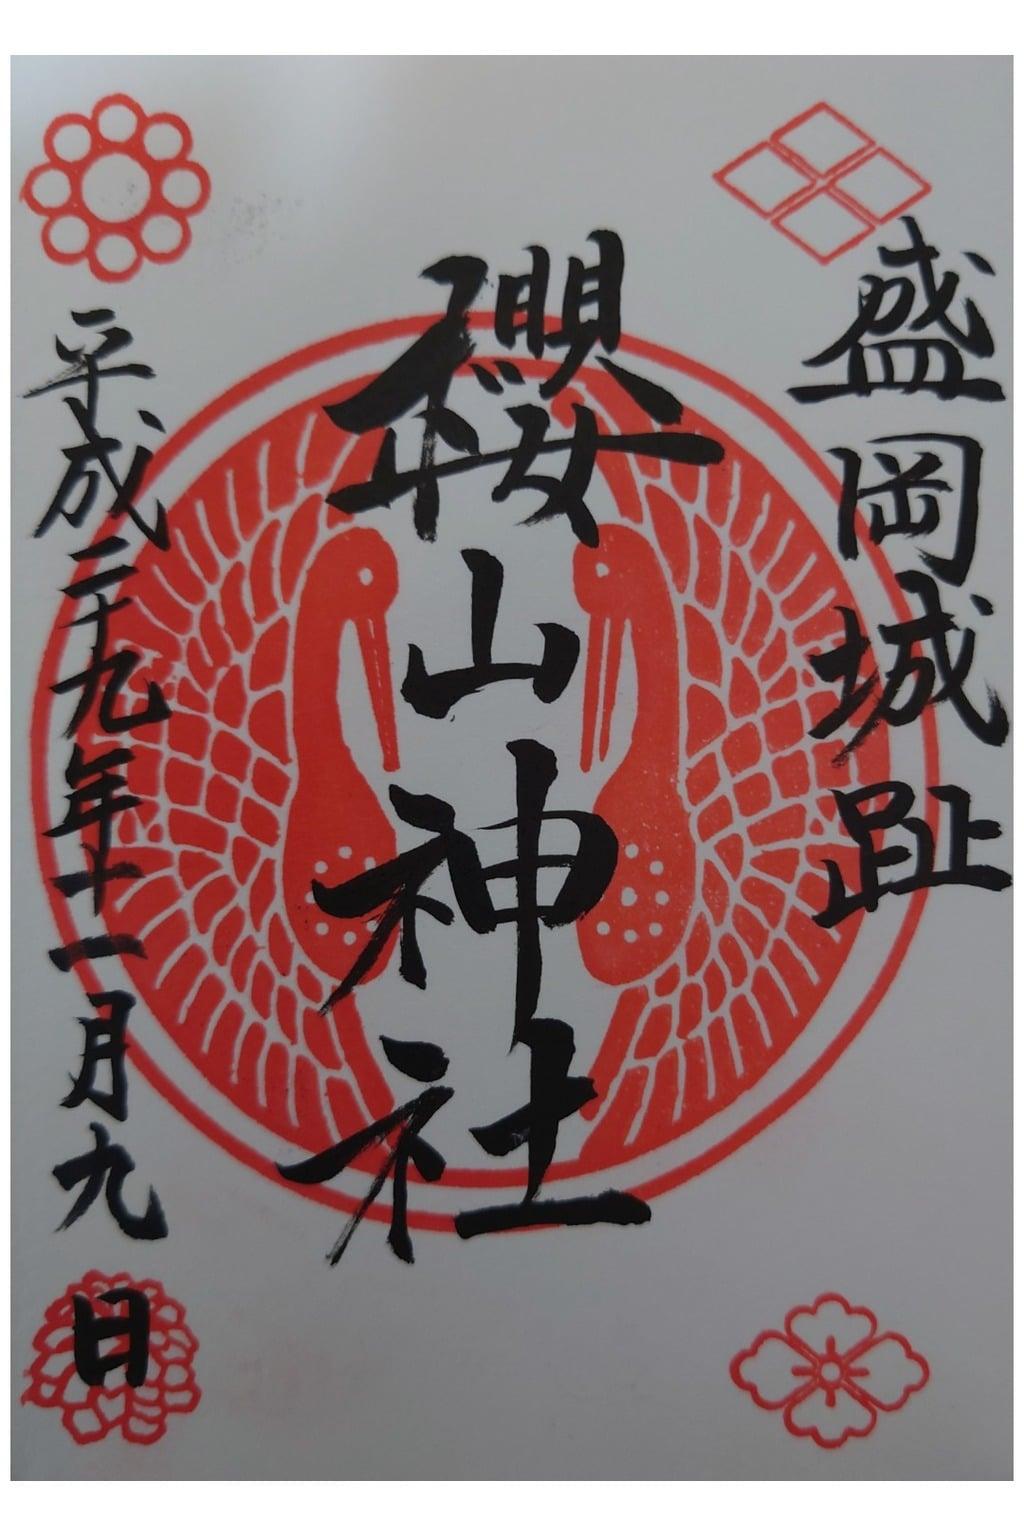 櫻山神社の御朱印